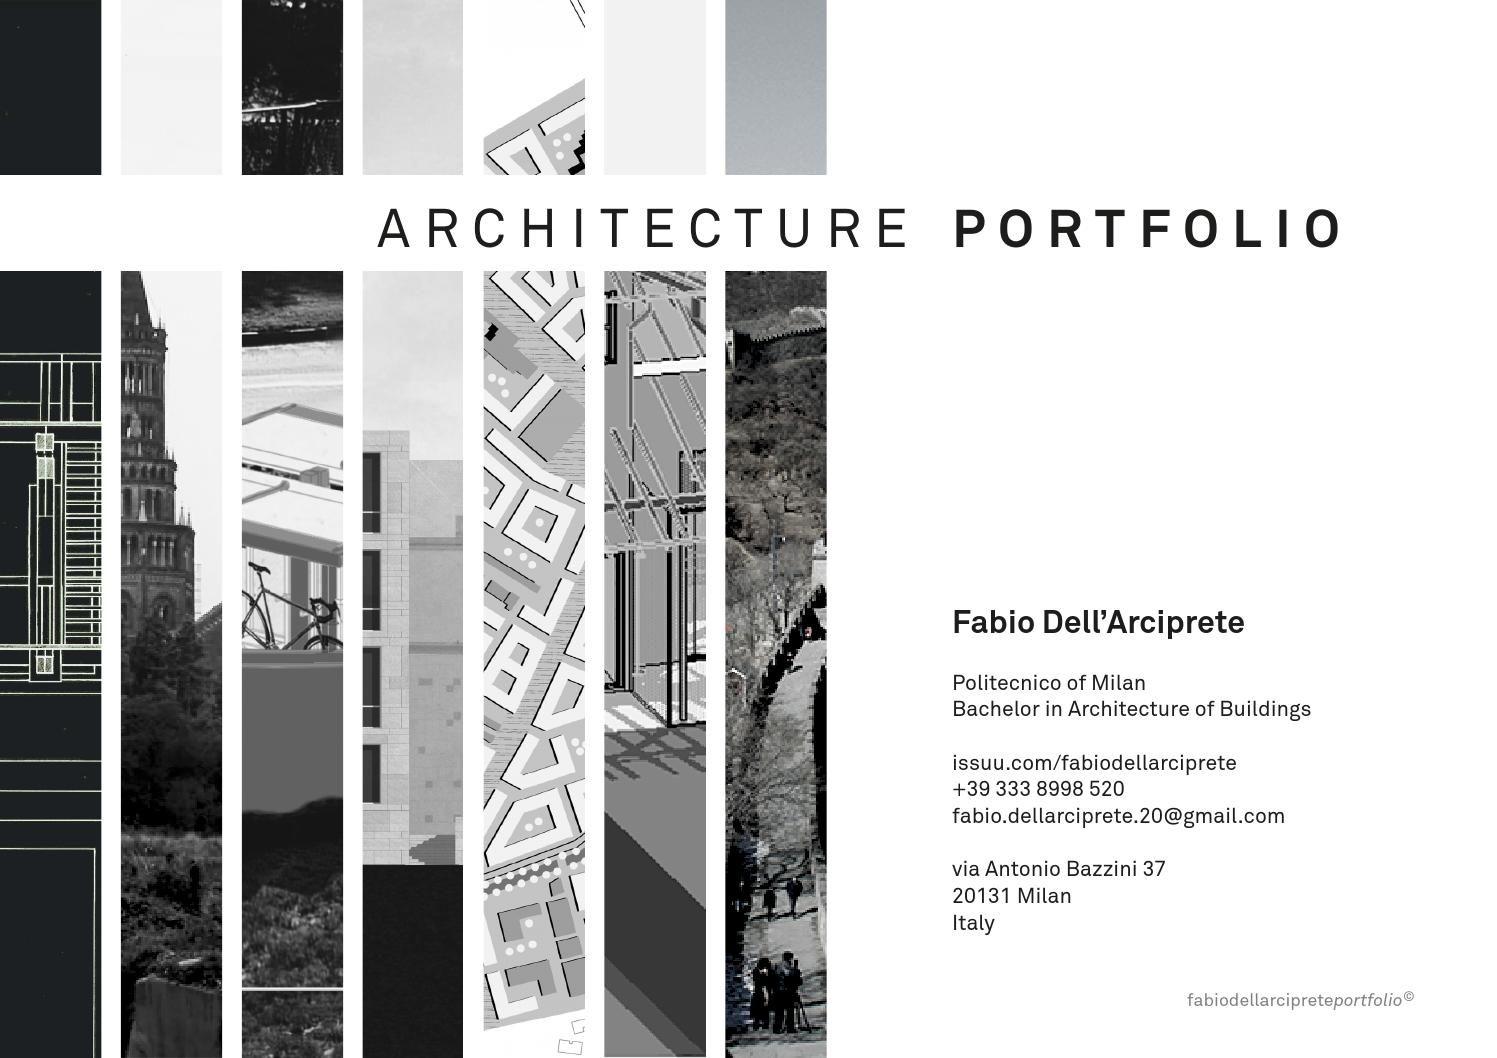 Architecture Portfolio | PPT | Architecture portfolio, Architecture